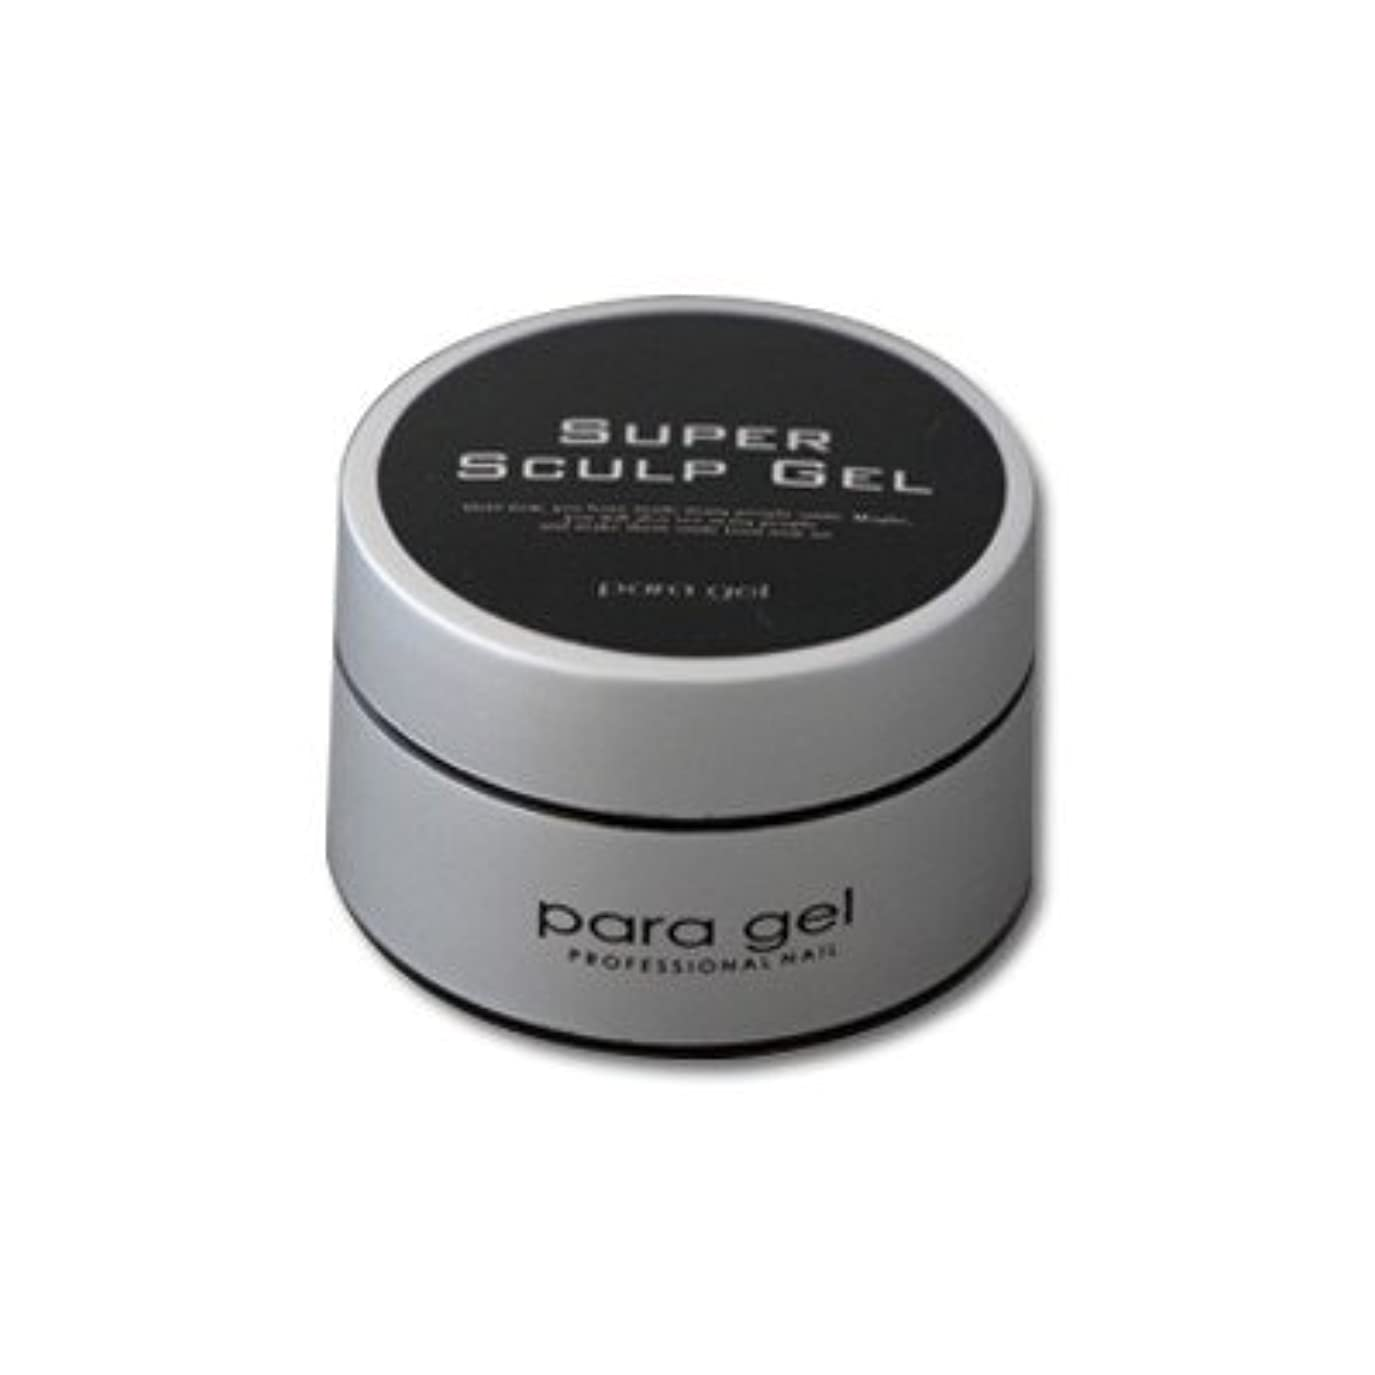 para gel(パラジェル) スーパースカルプジェル 10g